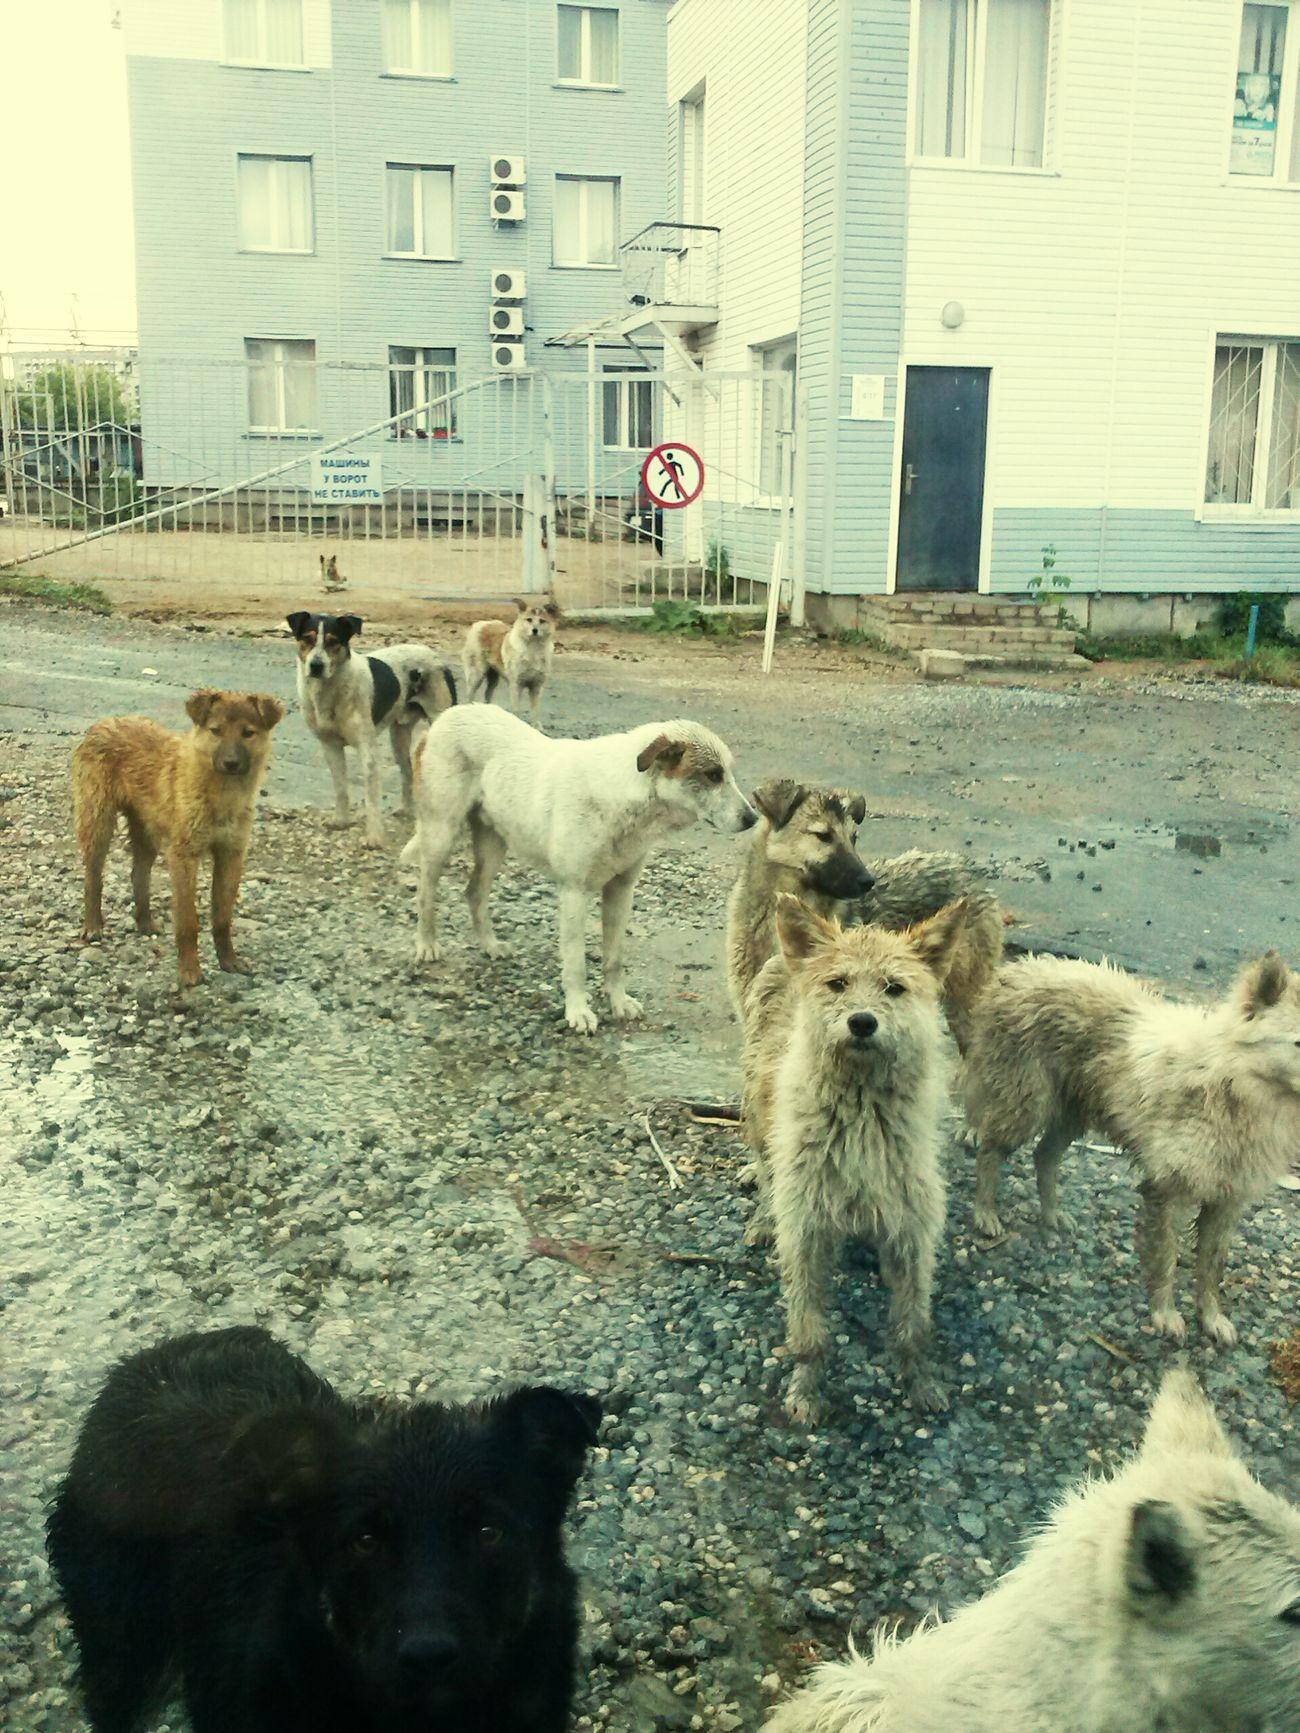 Dogs Homeless Sad City Nofood